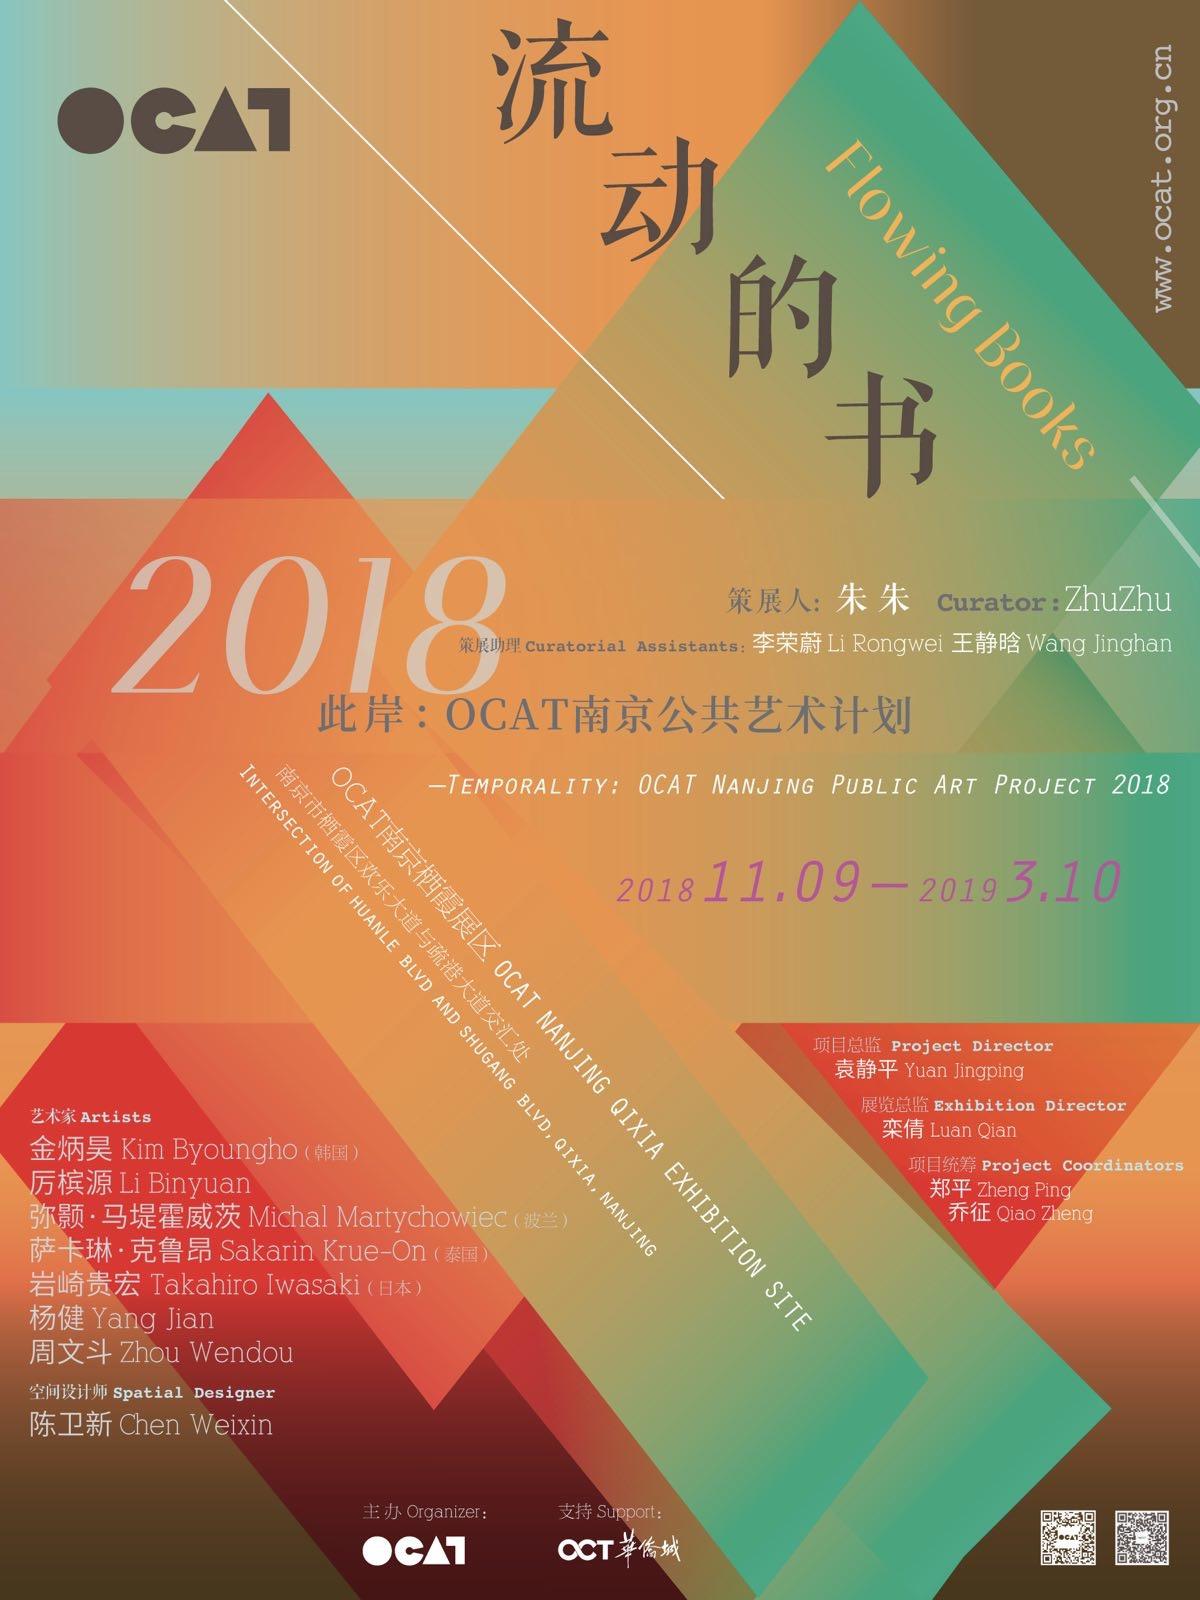 Zhou Wendou dans le projet d'art public de l'OCAT Nanjing 2018